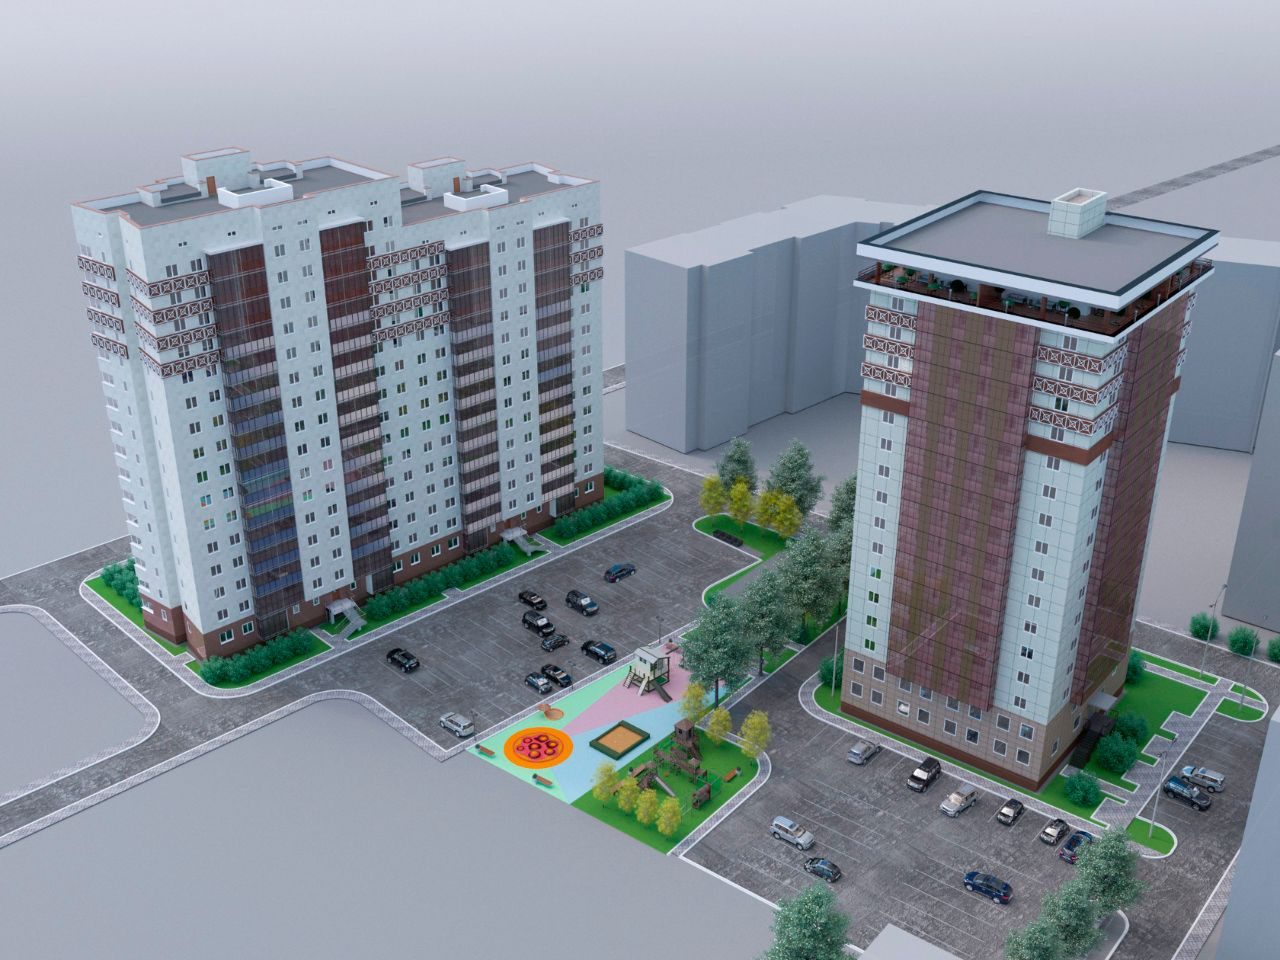 купить квартиру в ЖК по ул. Тимирязева, квартал 37